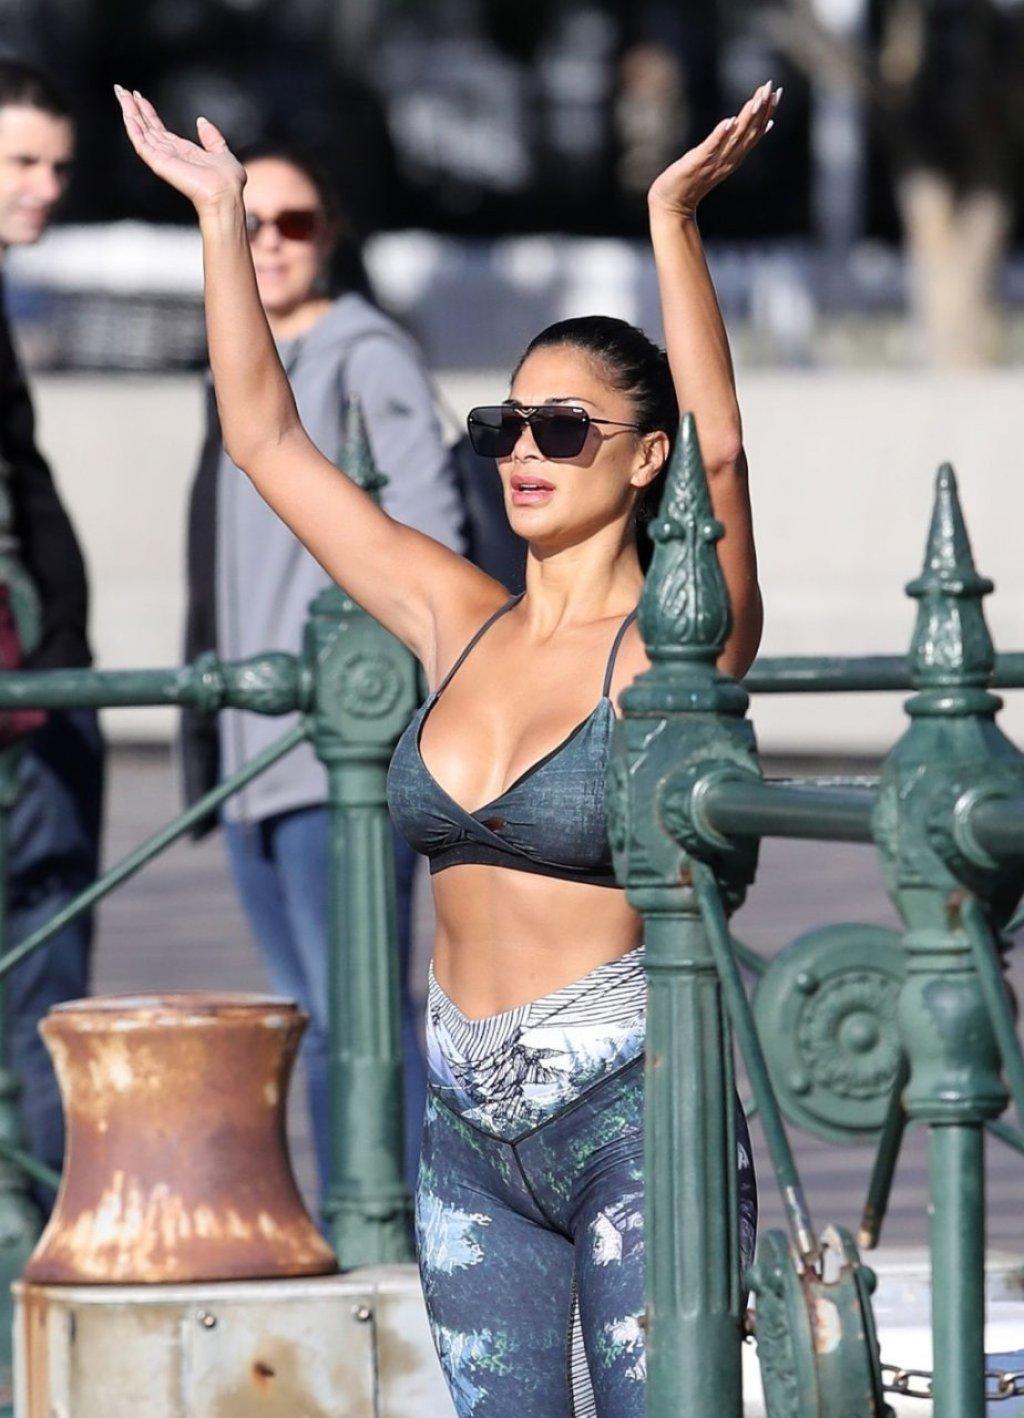 Nicole Scherzinger Sexy (29 New Photos)